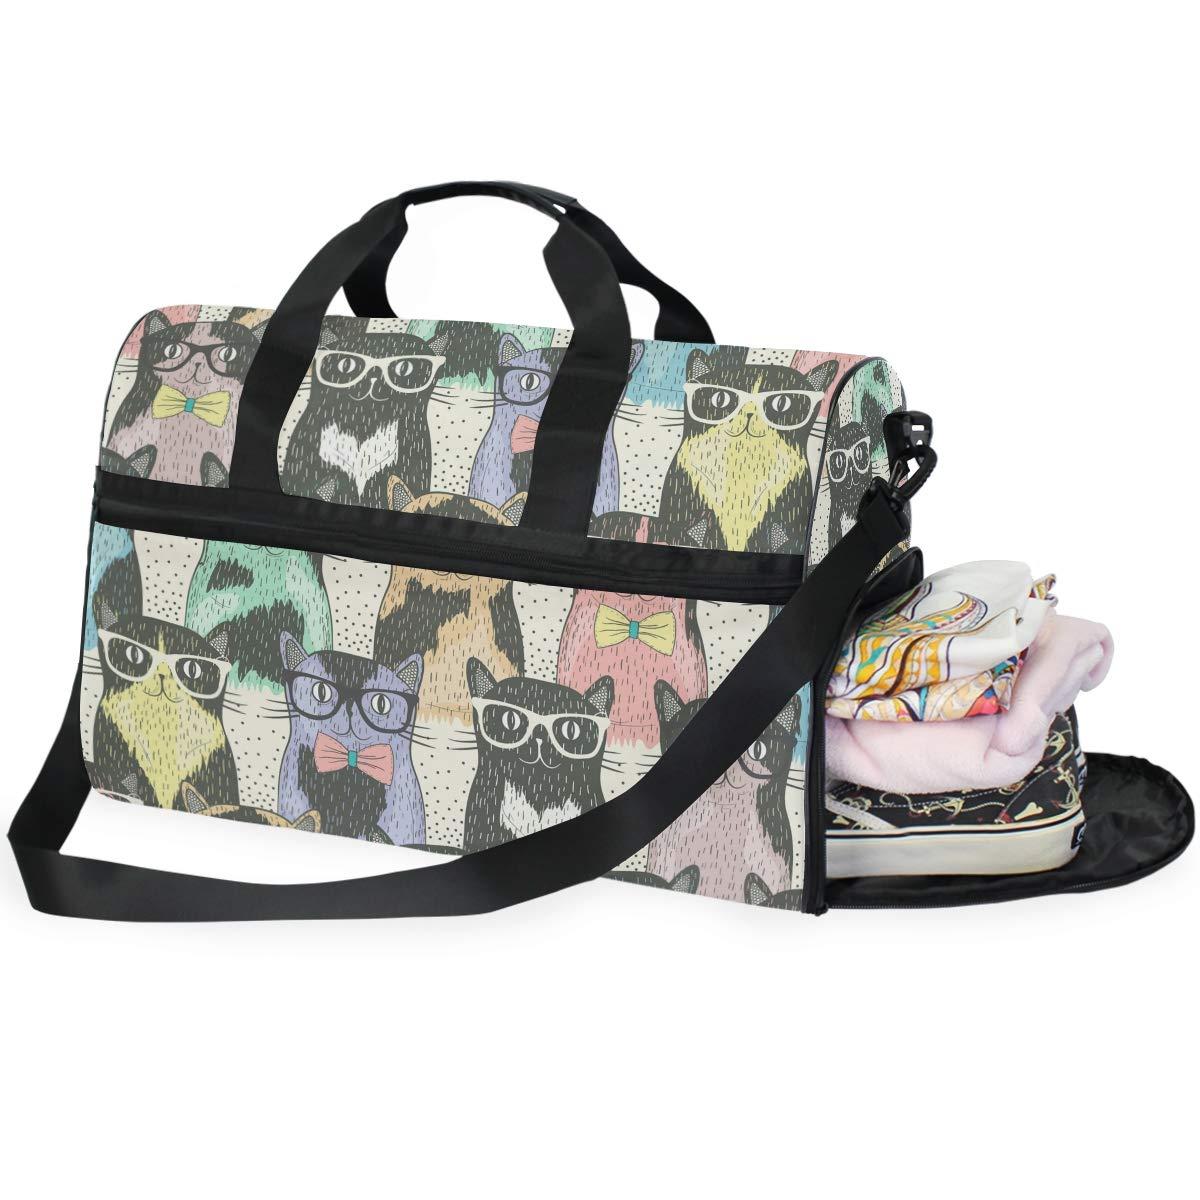 Gym Travel Duffel Bag Cartoon Cat Waterproof Lightweight Luggage bag for Sports Vacation